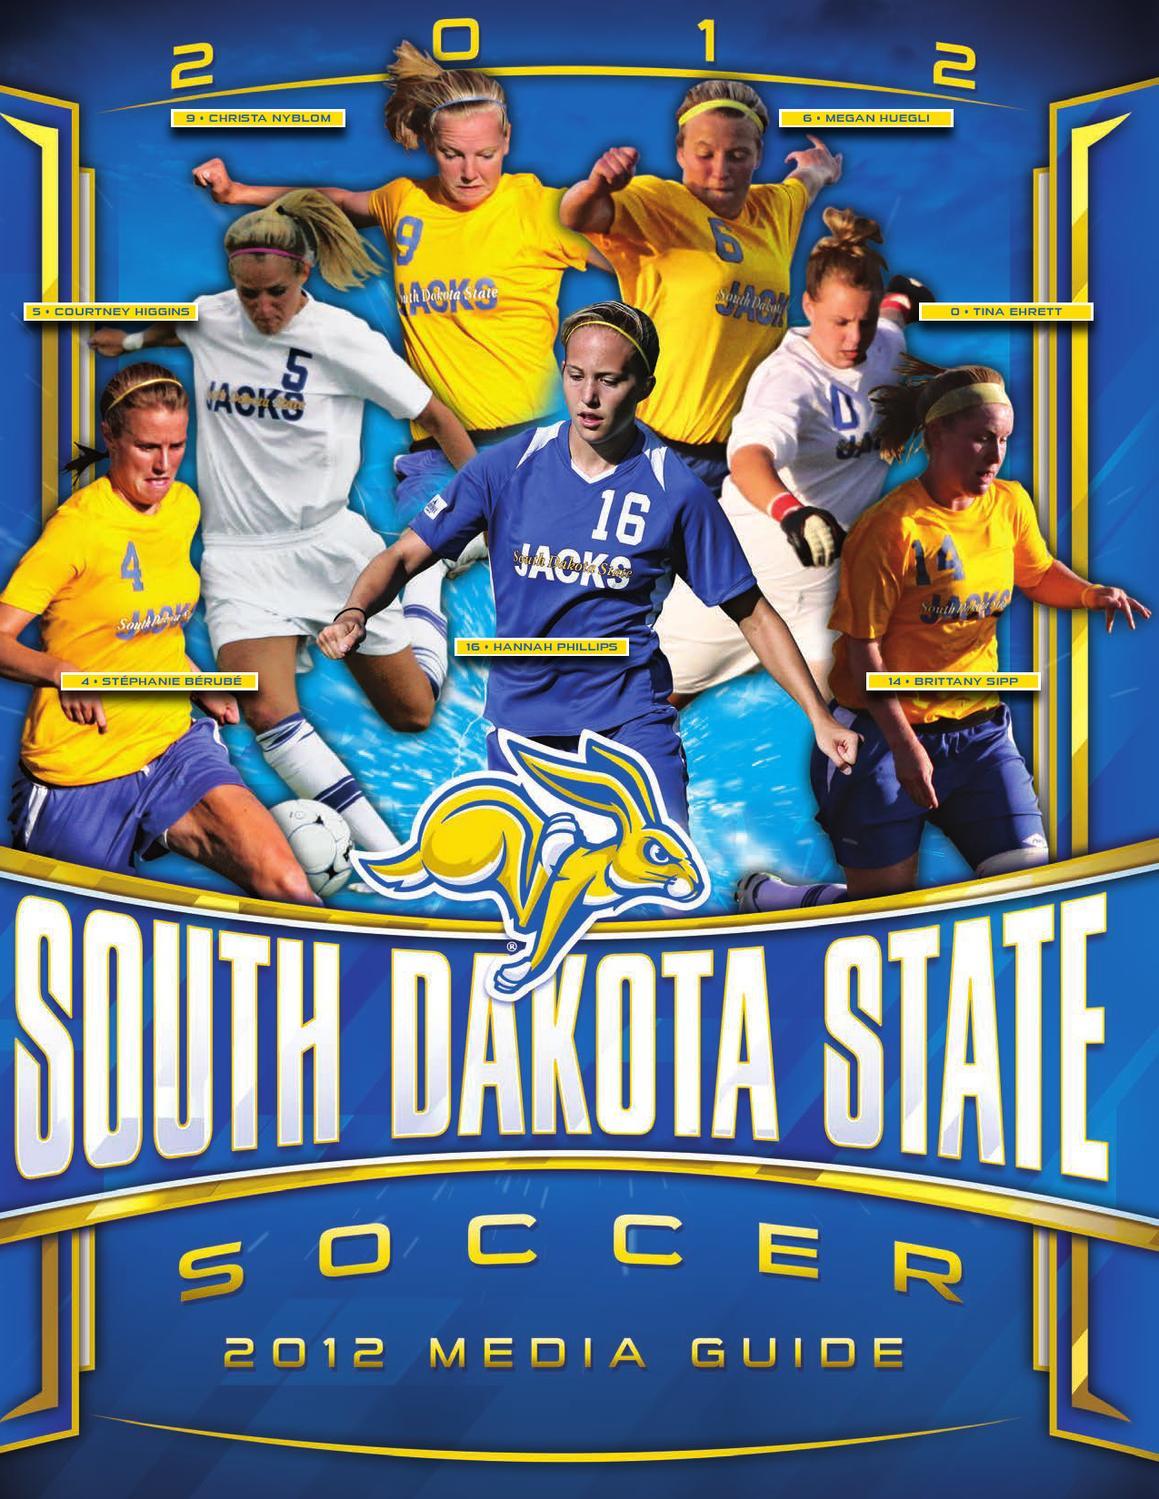 2012 South Dakota State Soccer Media Guide by South Dakota State University  Athletics - issuu bc8cdb0a2